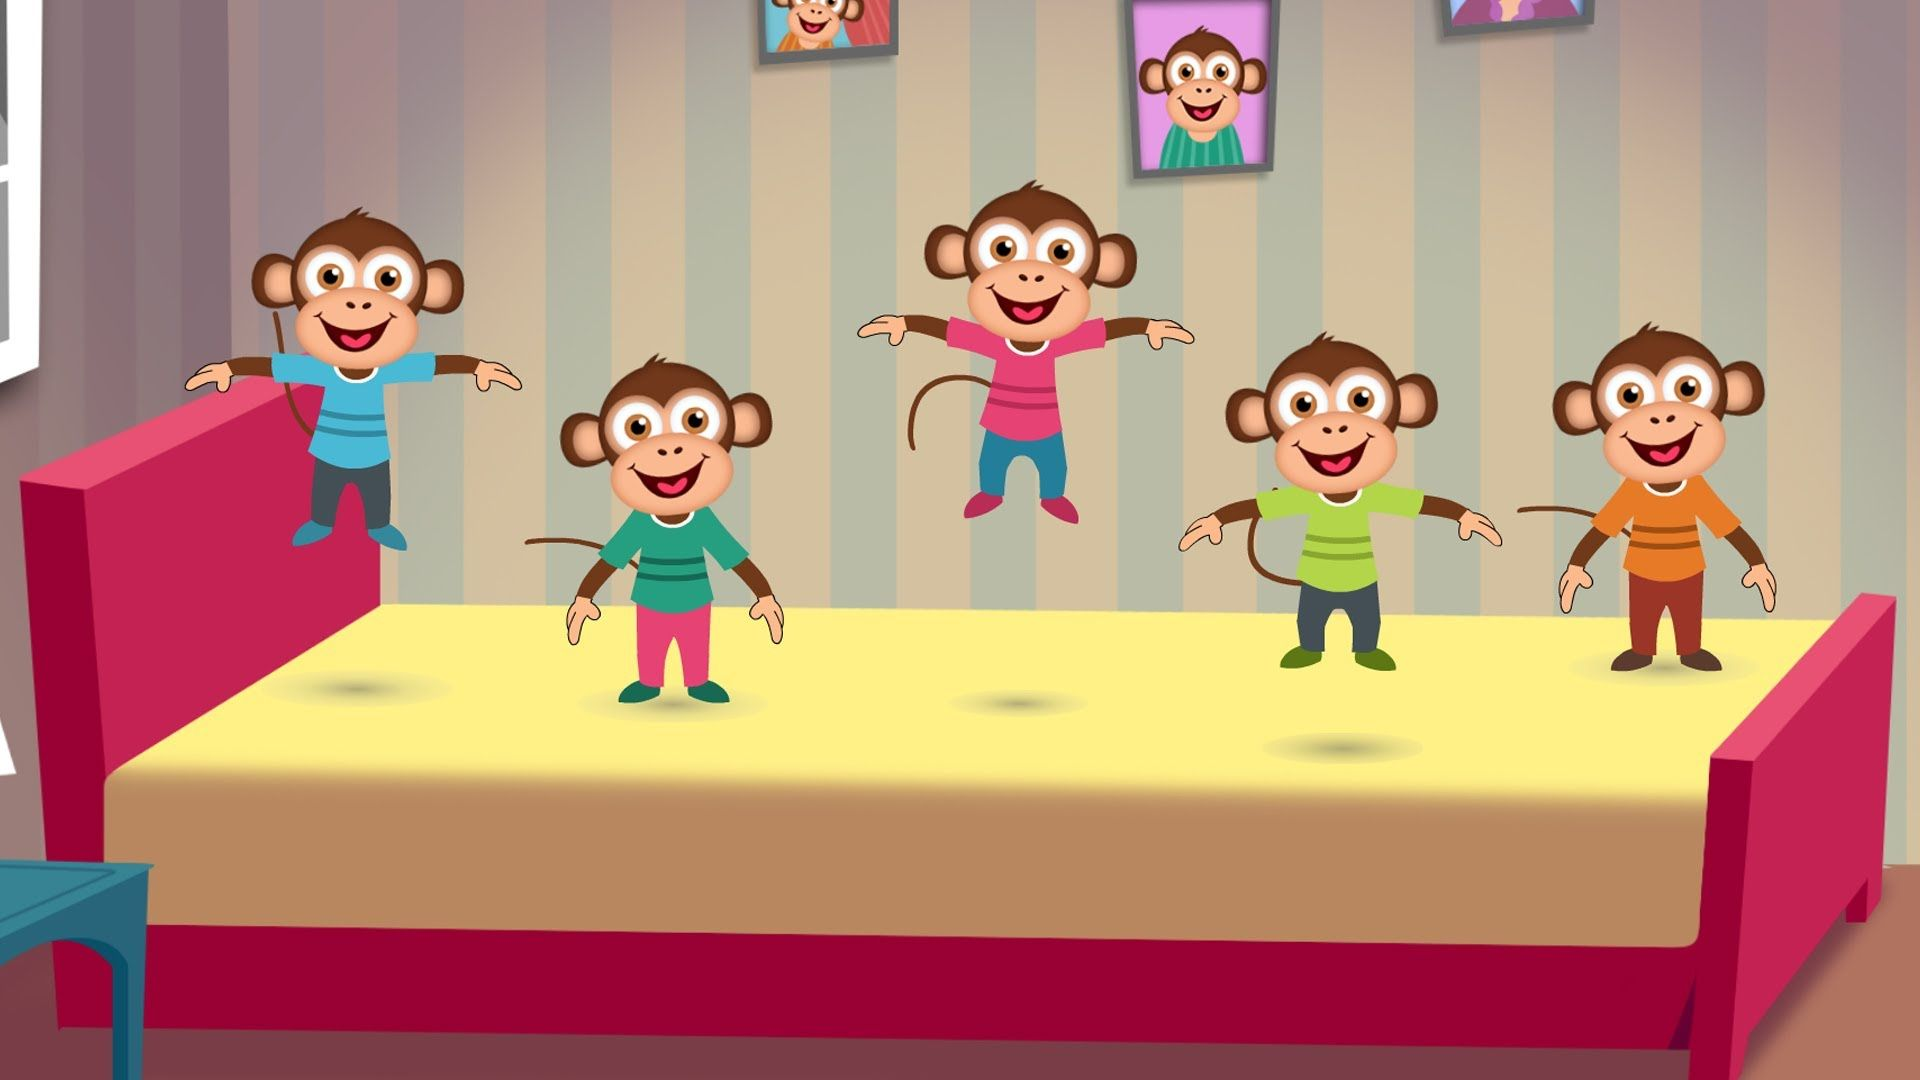 Five Little Monkeys Jumping On The Bed Nursery Rhyme